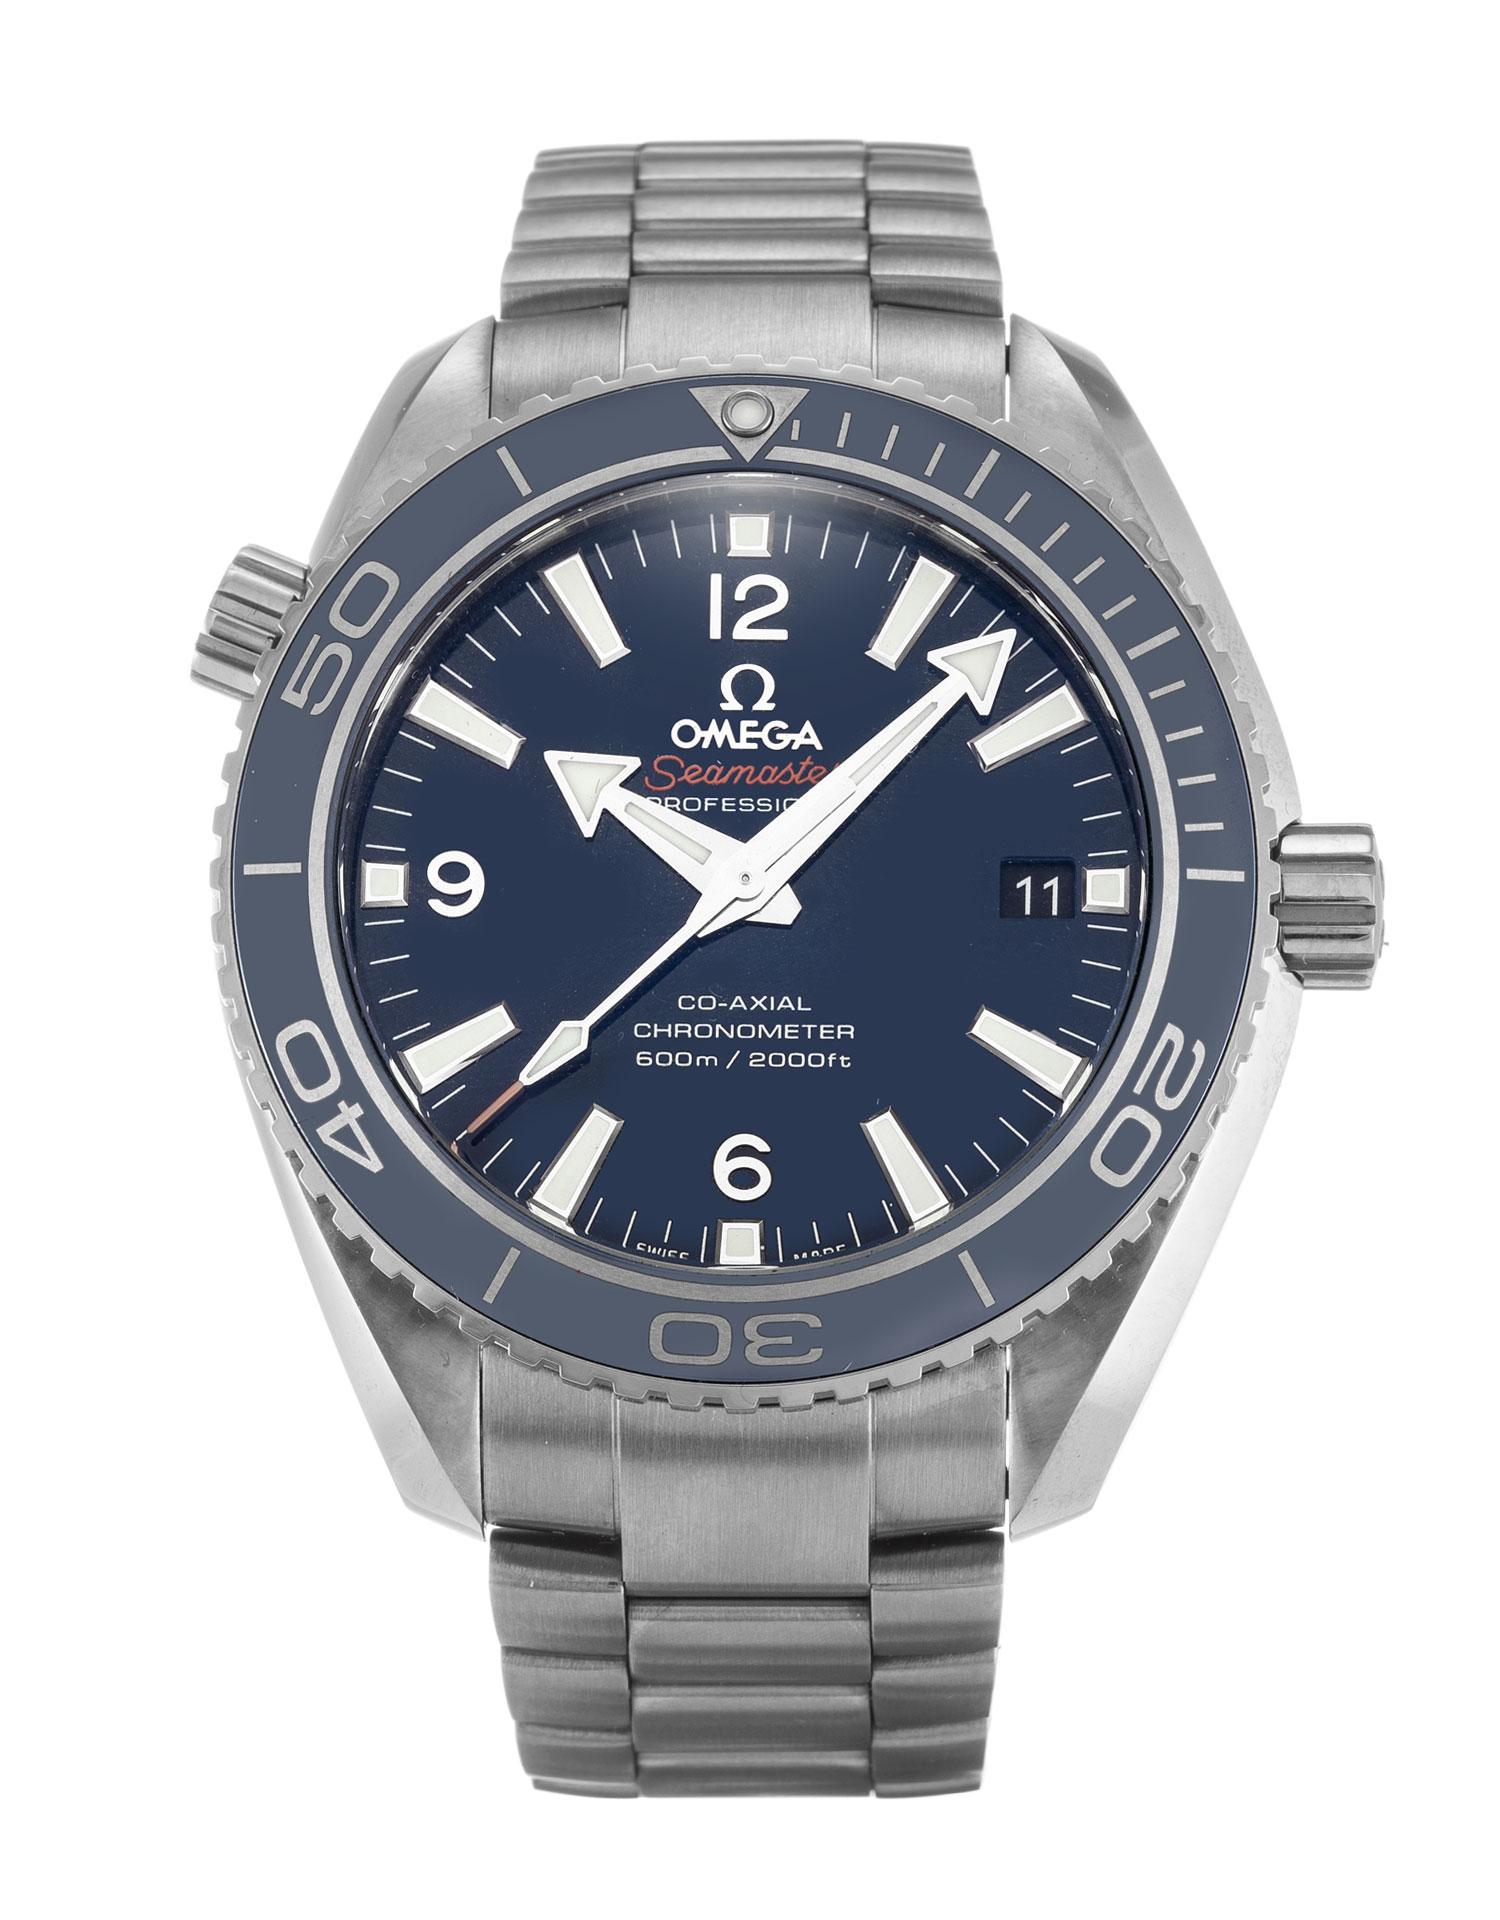 Omega Planet Ocean 232.90.42.21.03.001 Mens 42 Mm Titanium Case Automatic Movement – iapac.to